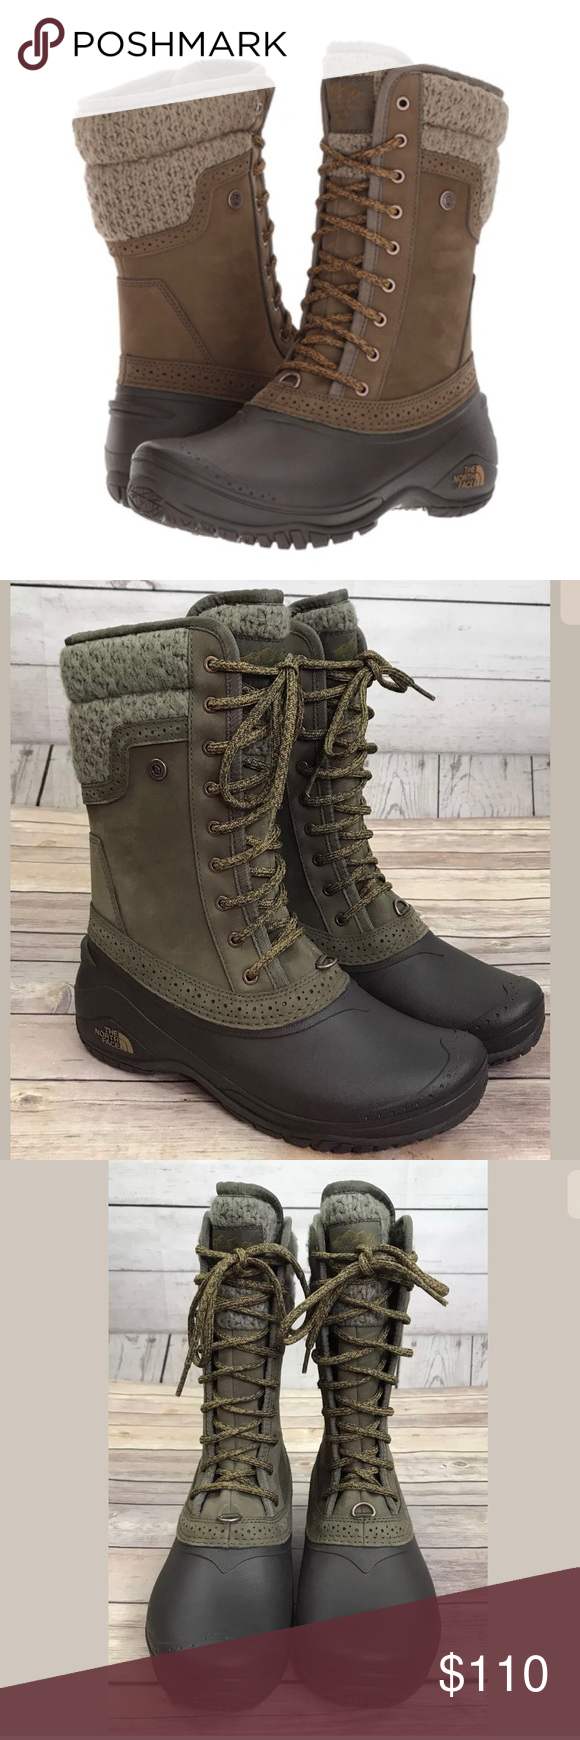 b480b083d3c7 NEW The North Face Shellista II Winter Boots 8 The North Face Shellista II  Mid Boots